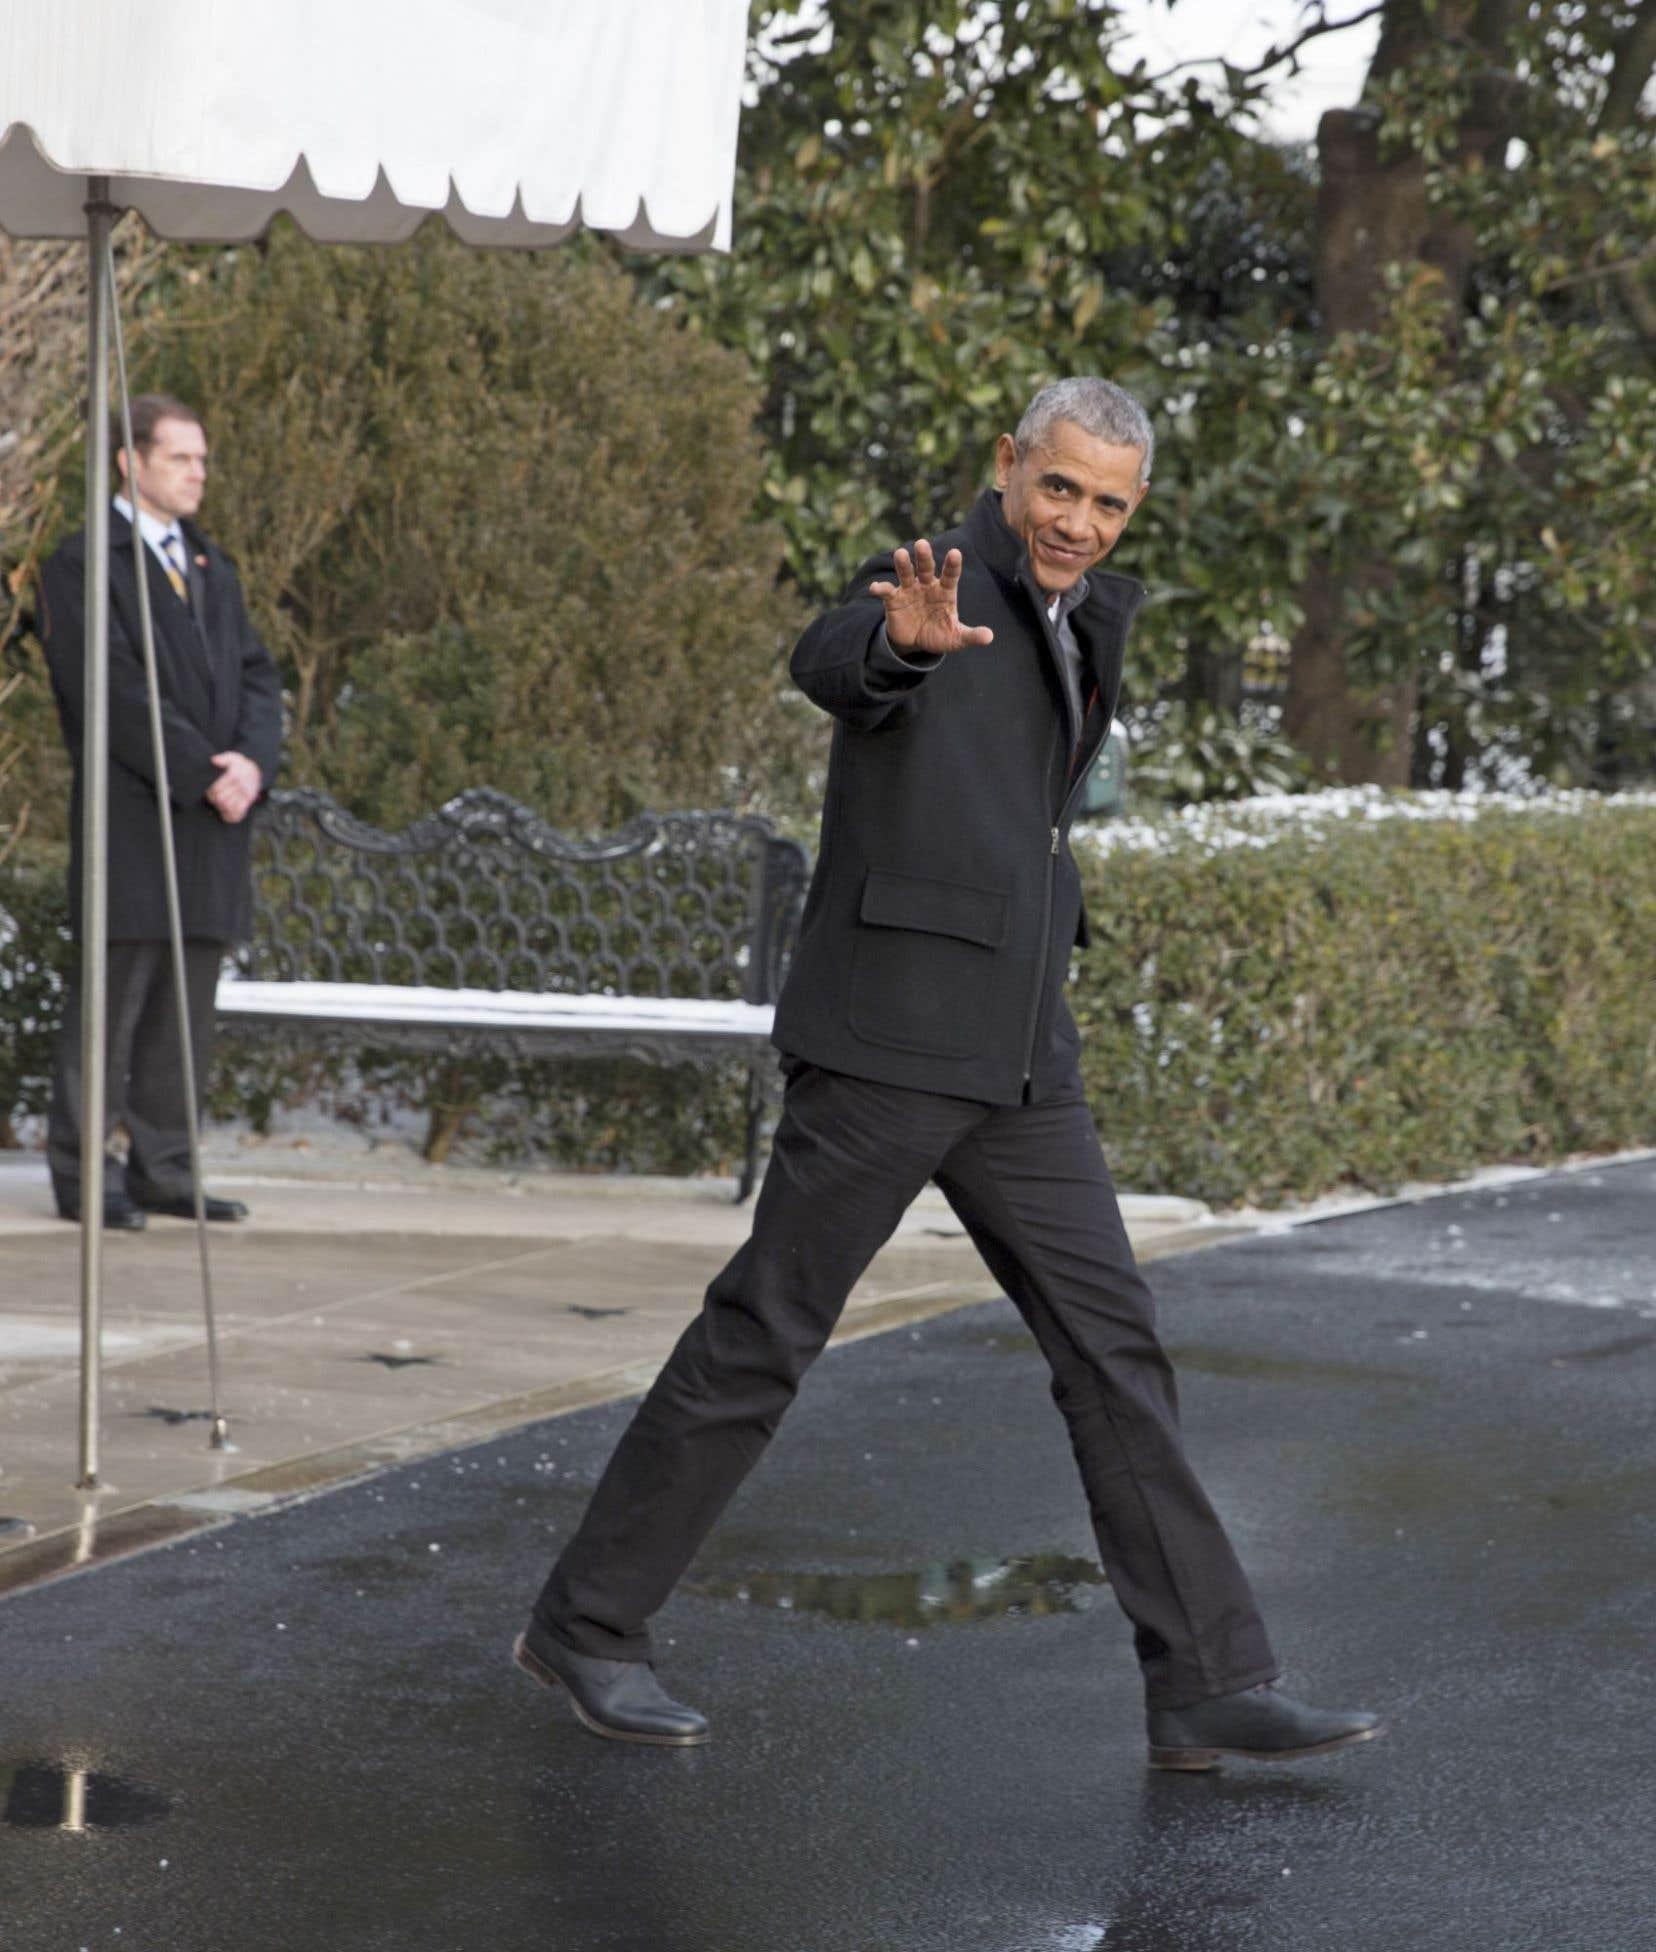 Barack Obama prononcera son discours d'adieu mardi à Chicago.